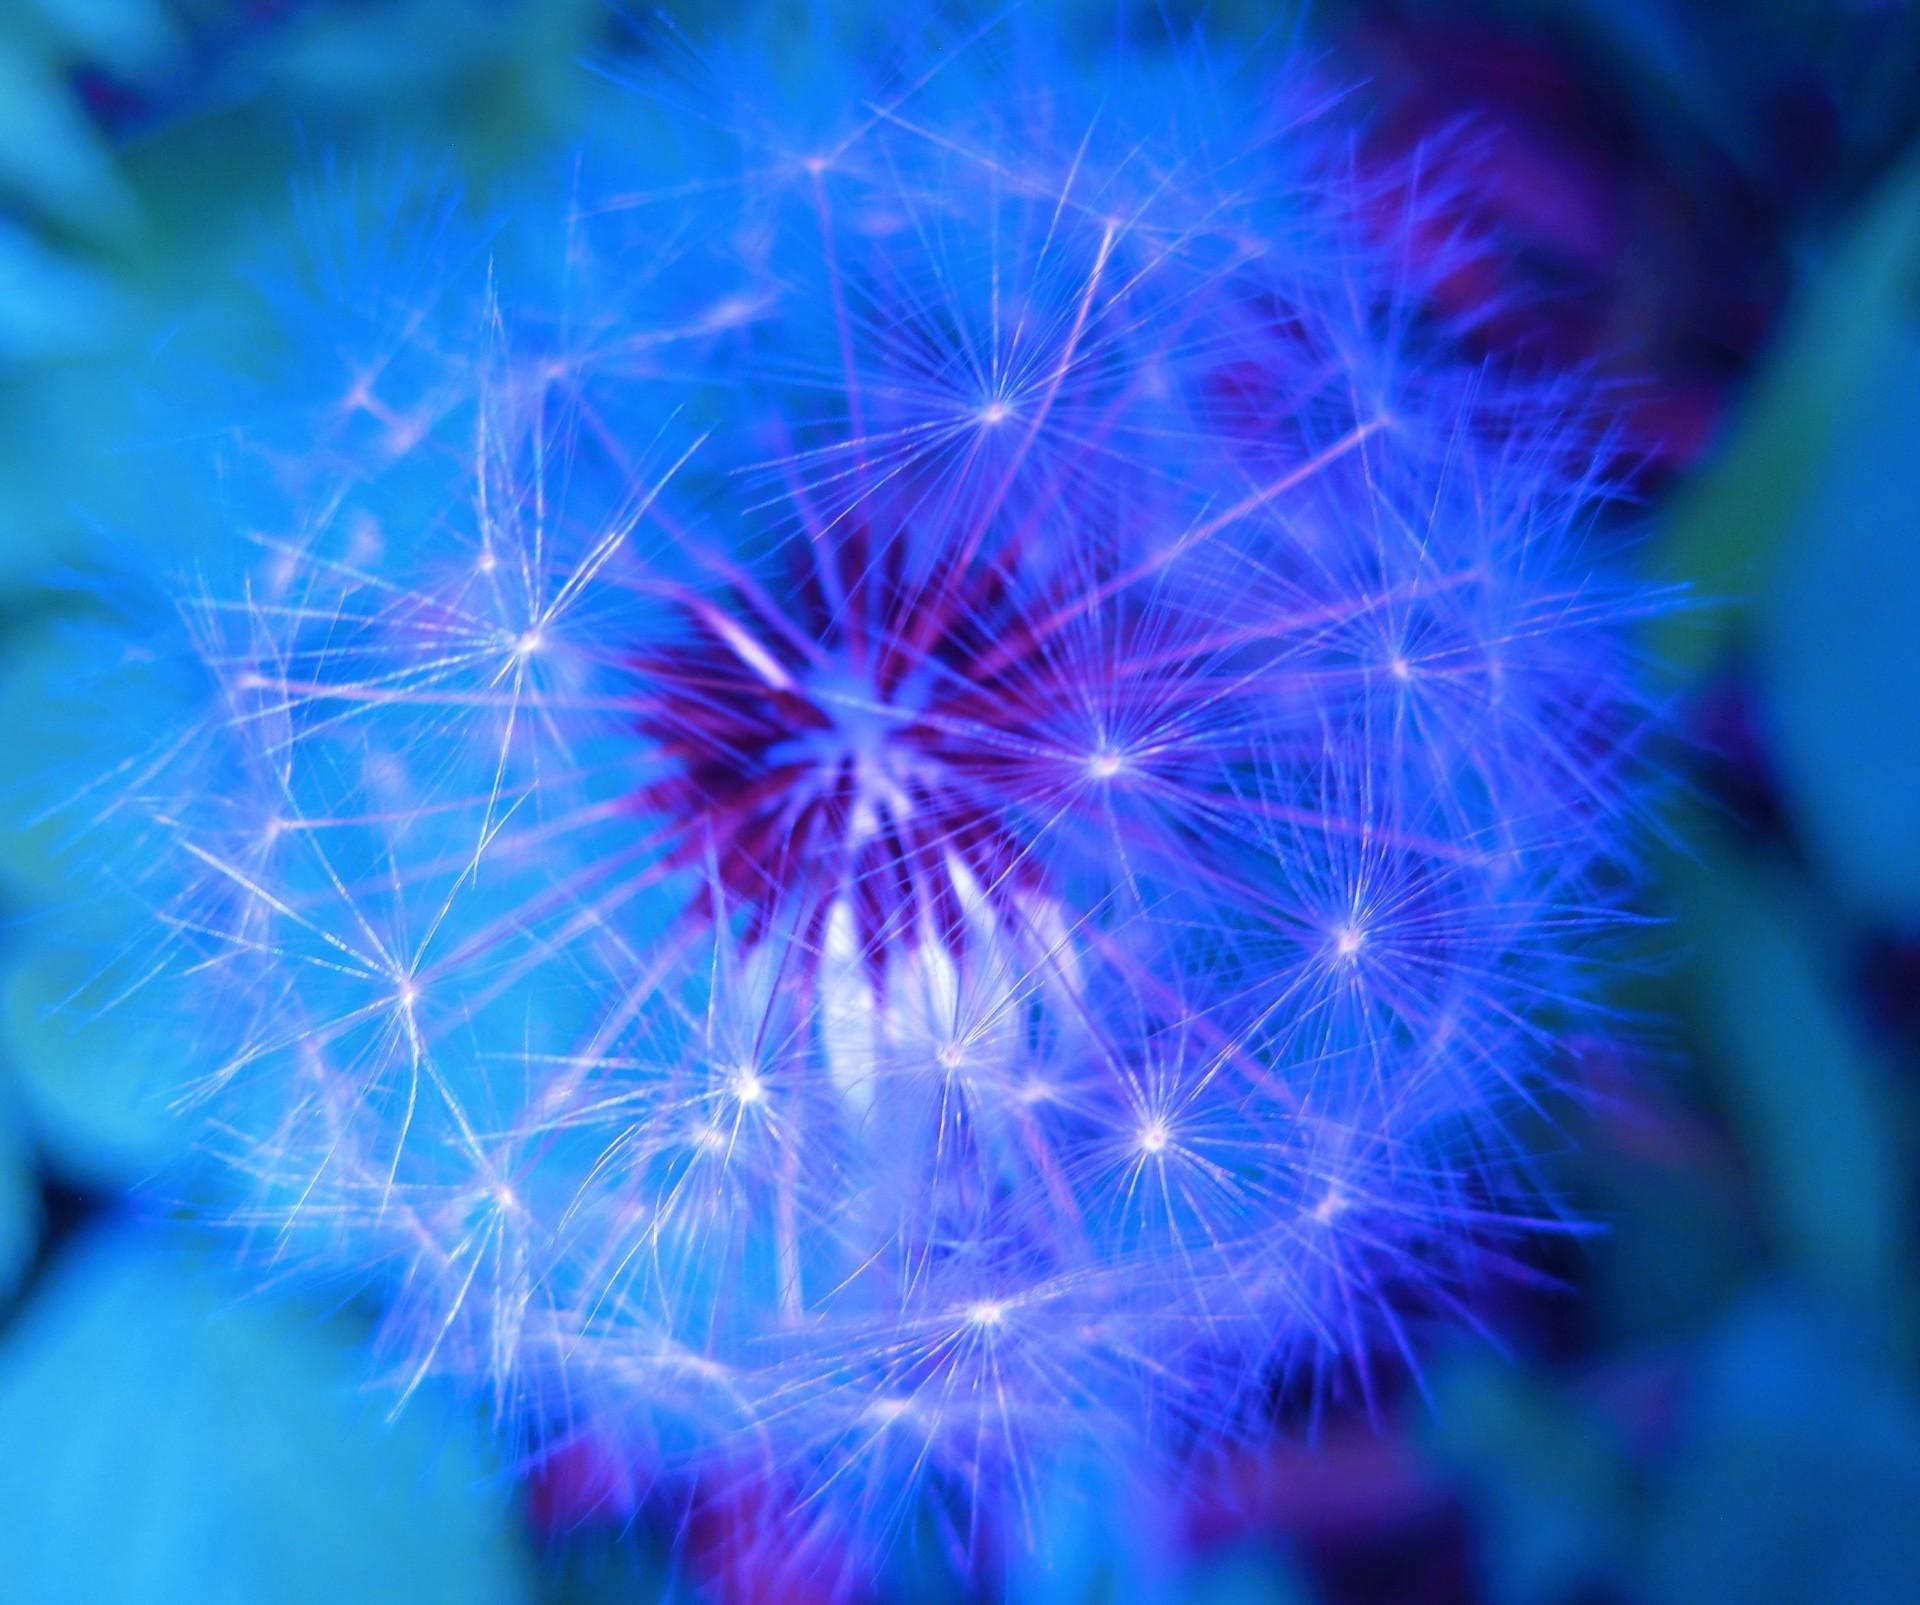 Shutterstock Hd Wallpapers Blue Tinted Dandelion Free Stock Photo Public Domain